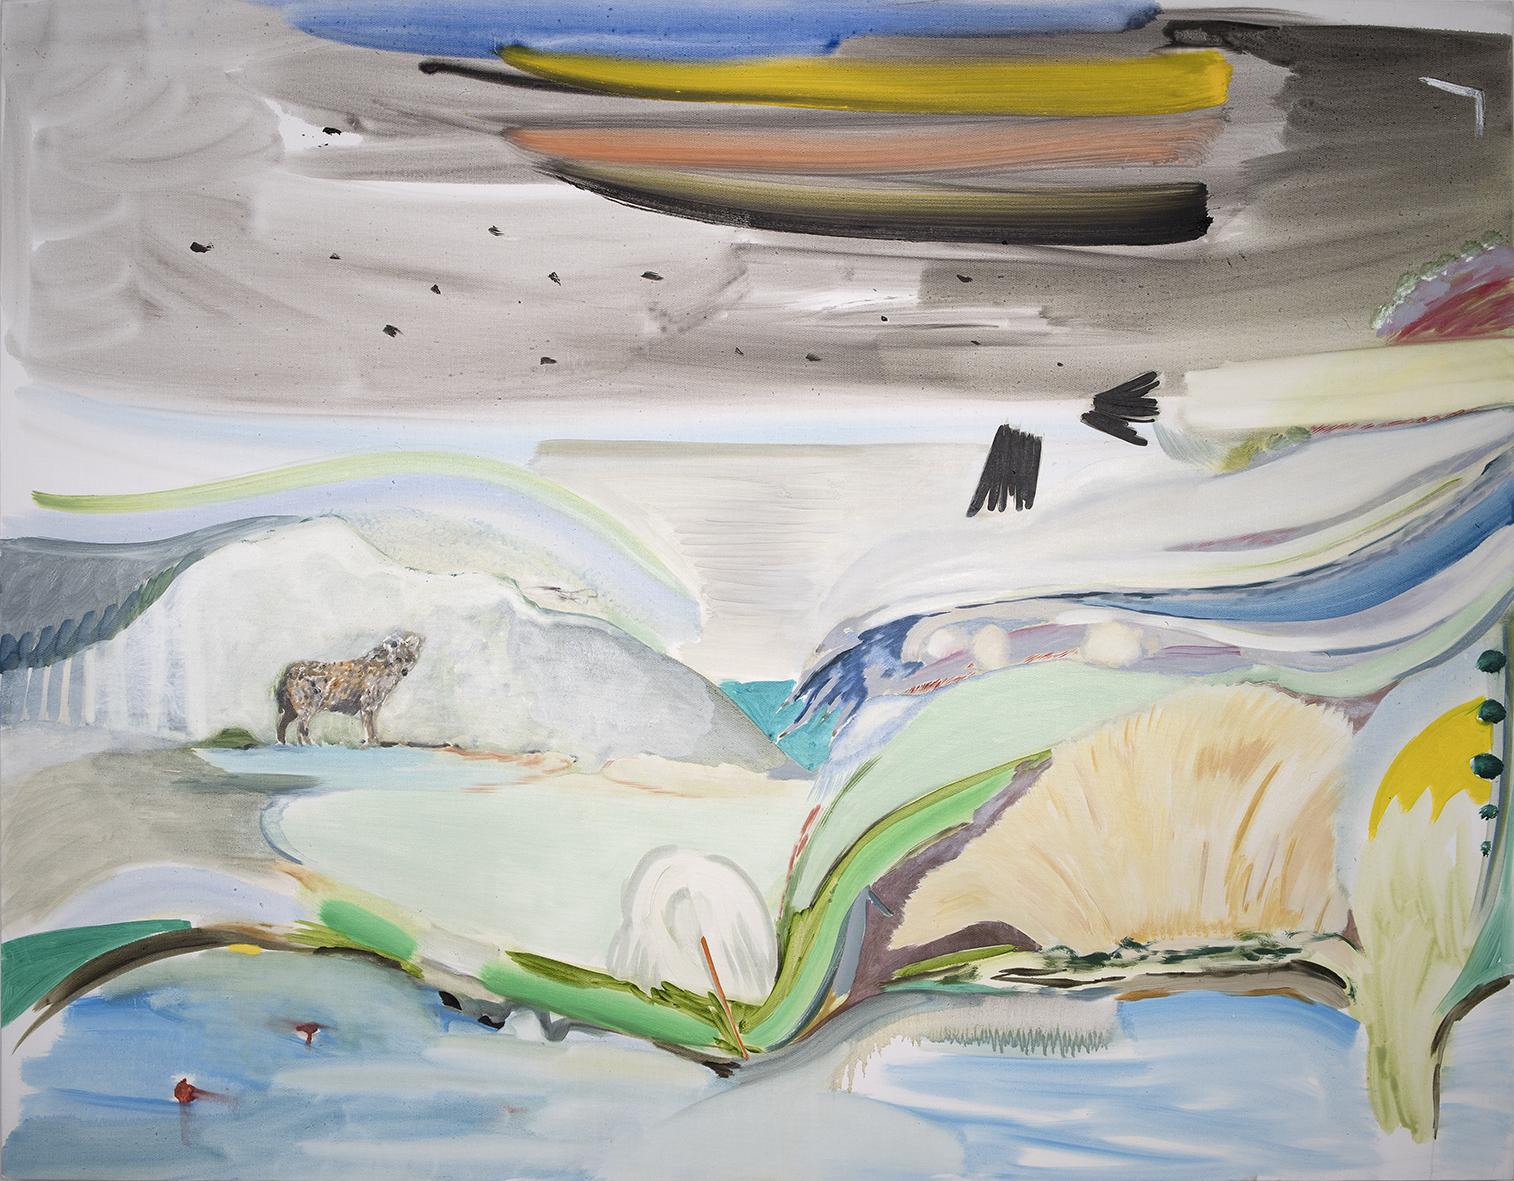 Vera Portatadino, So Long, Now, 2016, olio su tela, 120 x 155 cm